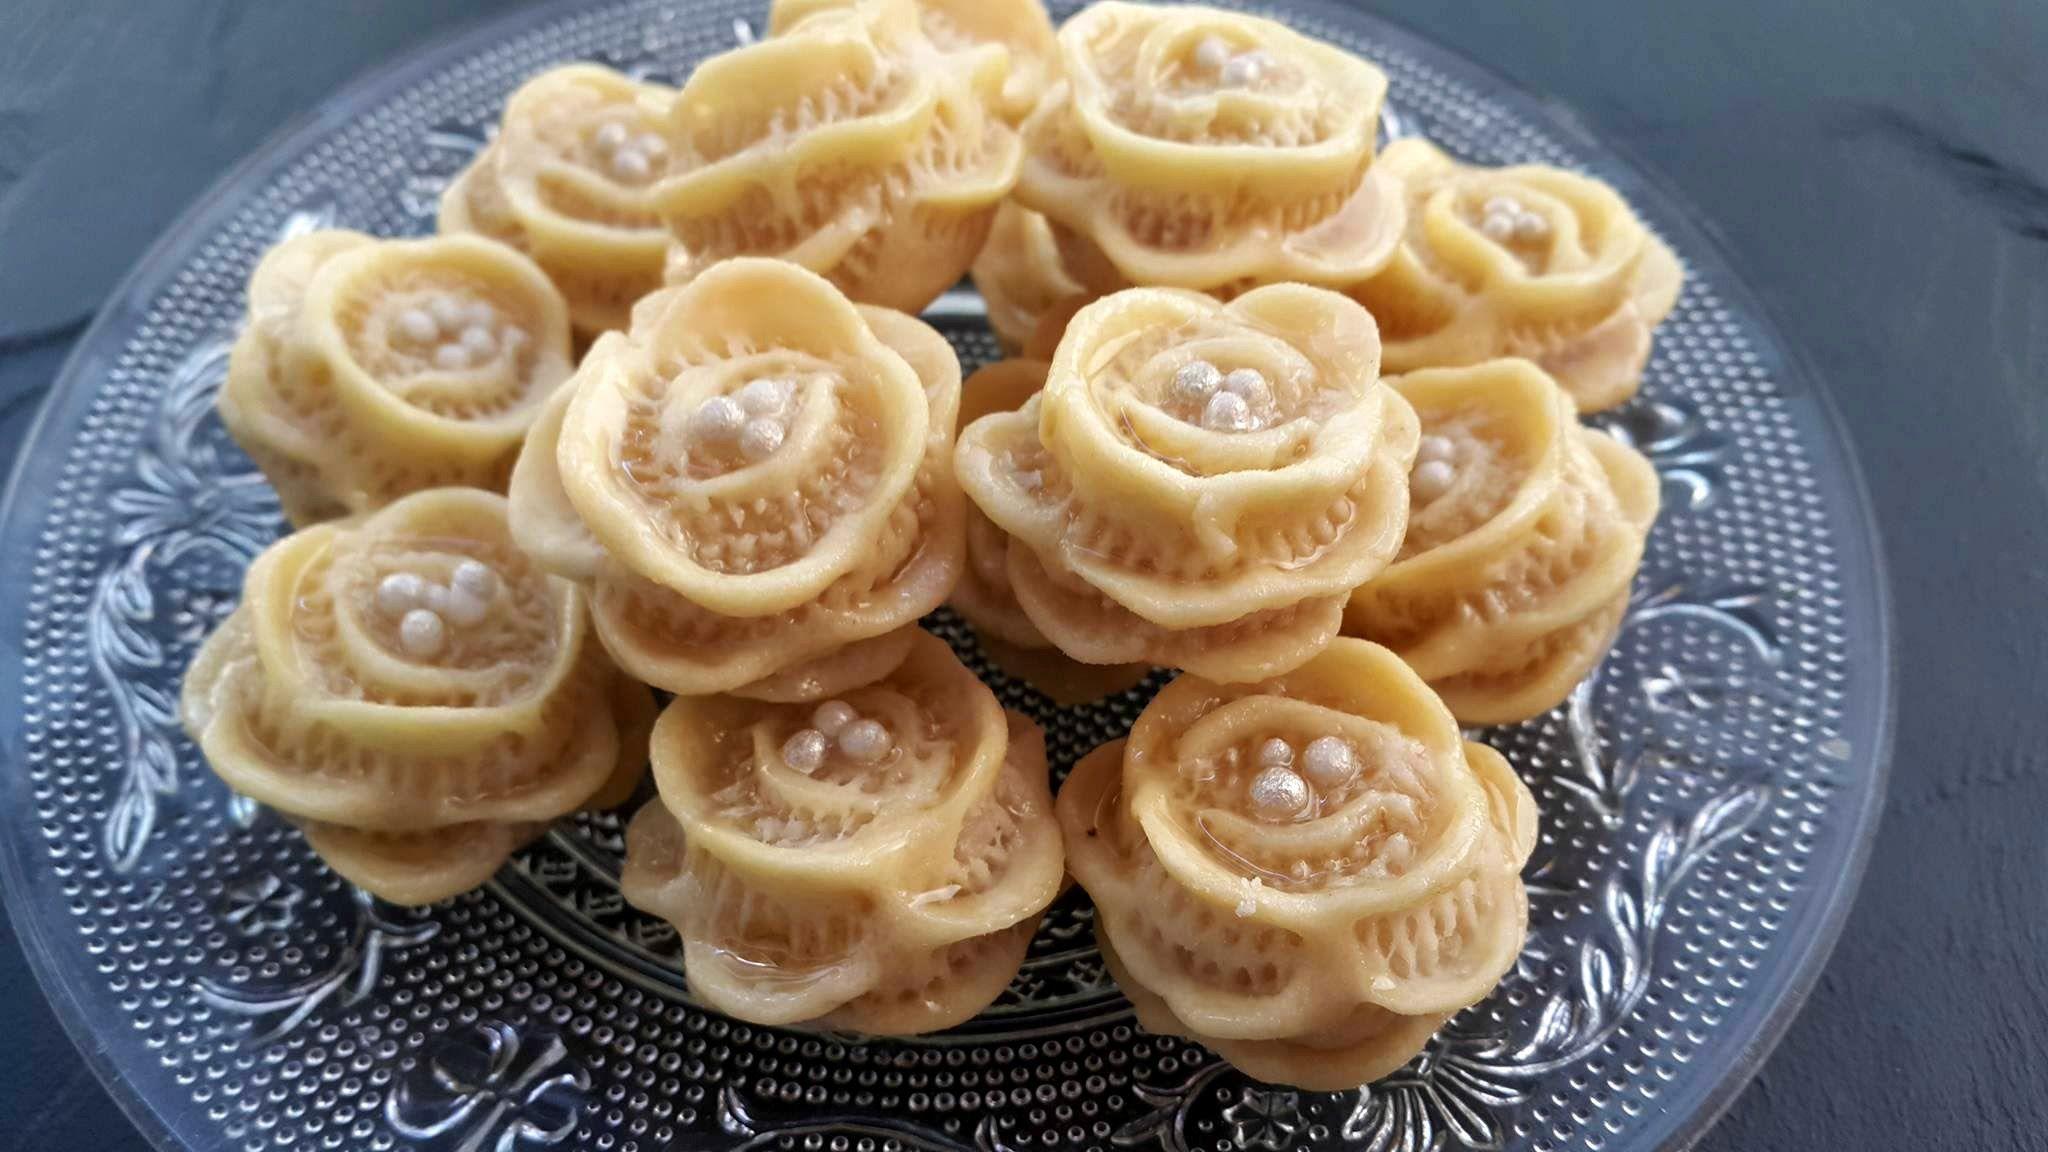 حلويات اللوز حلوة الوردة المقادير تحت الفيديو Petits Fours Aux Amandes Youtube Food Sugar Cookie Recipe Easy Bakery Desserts